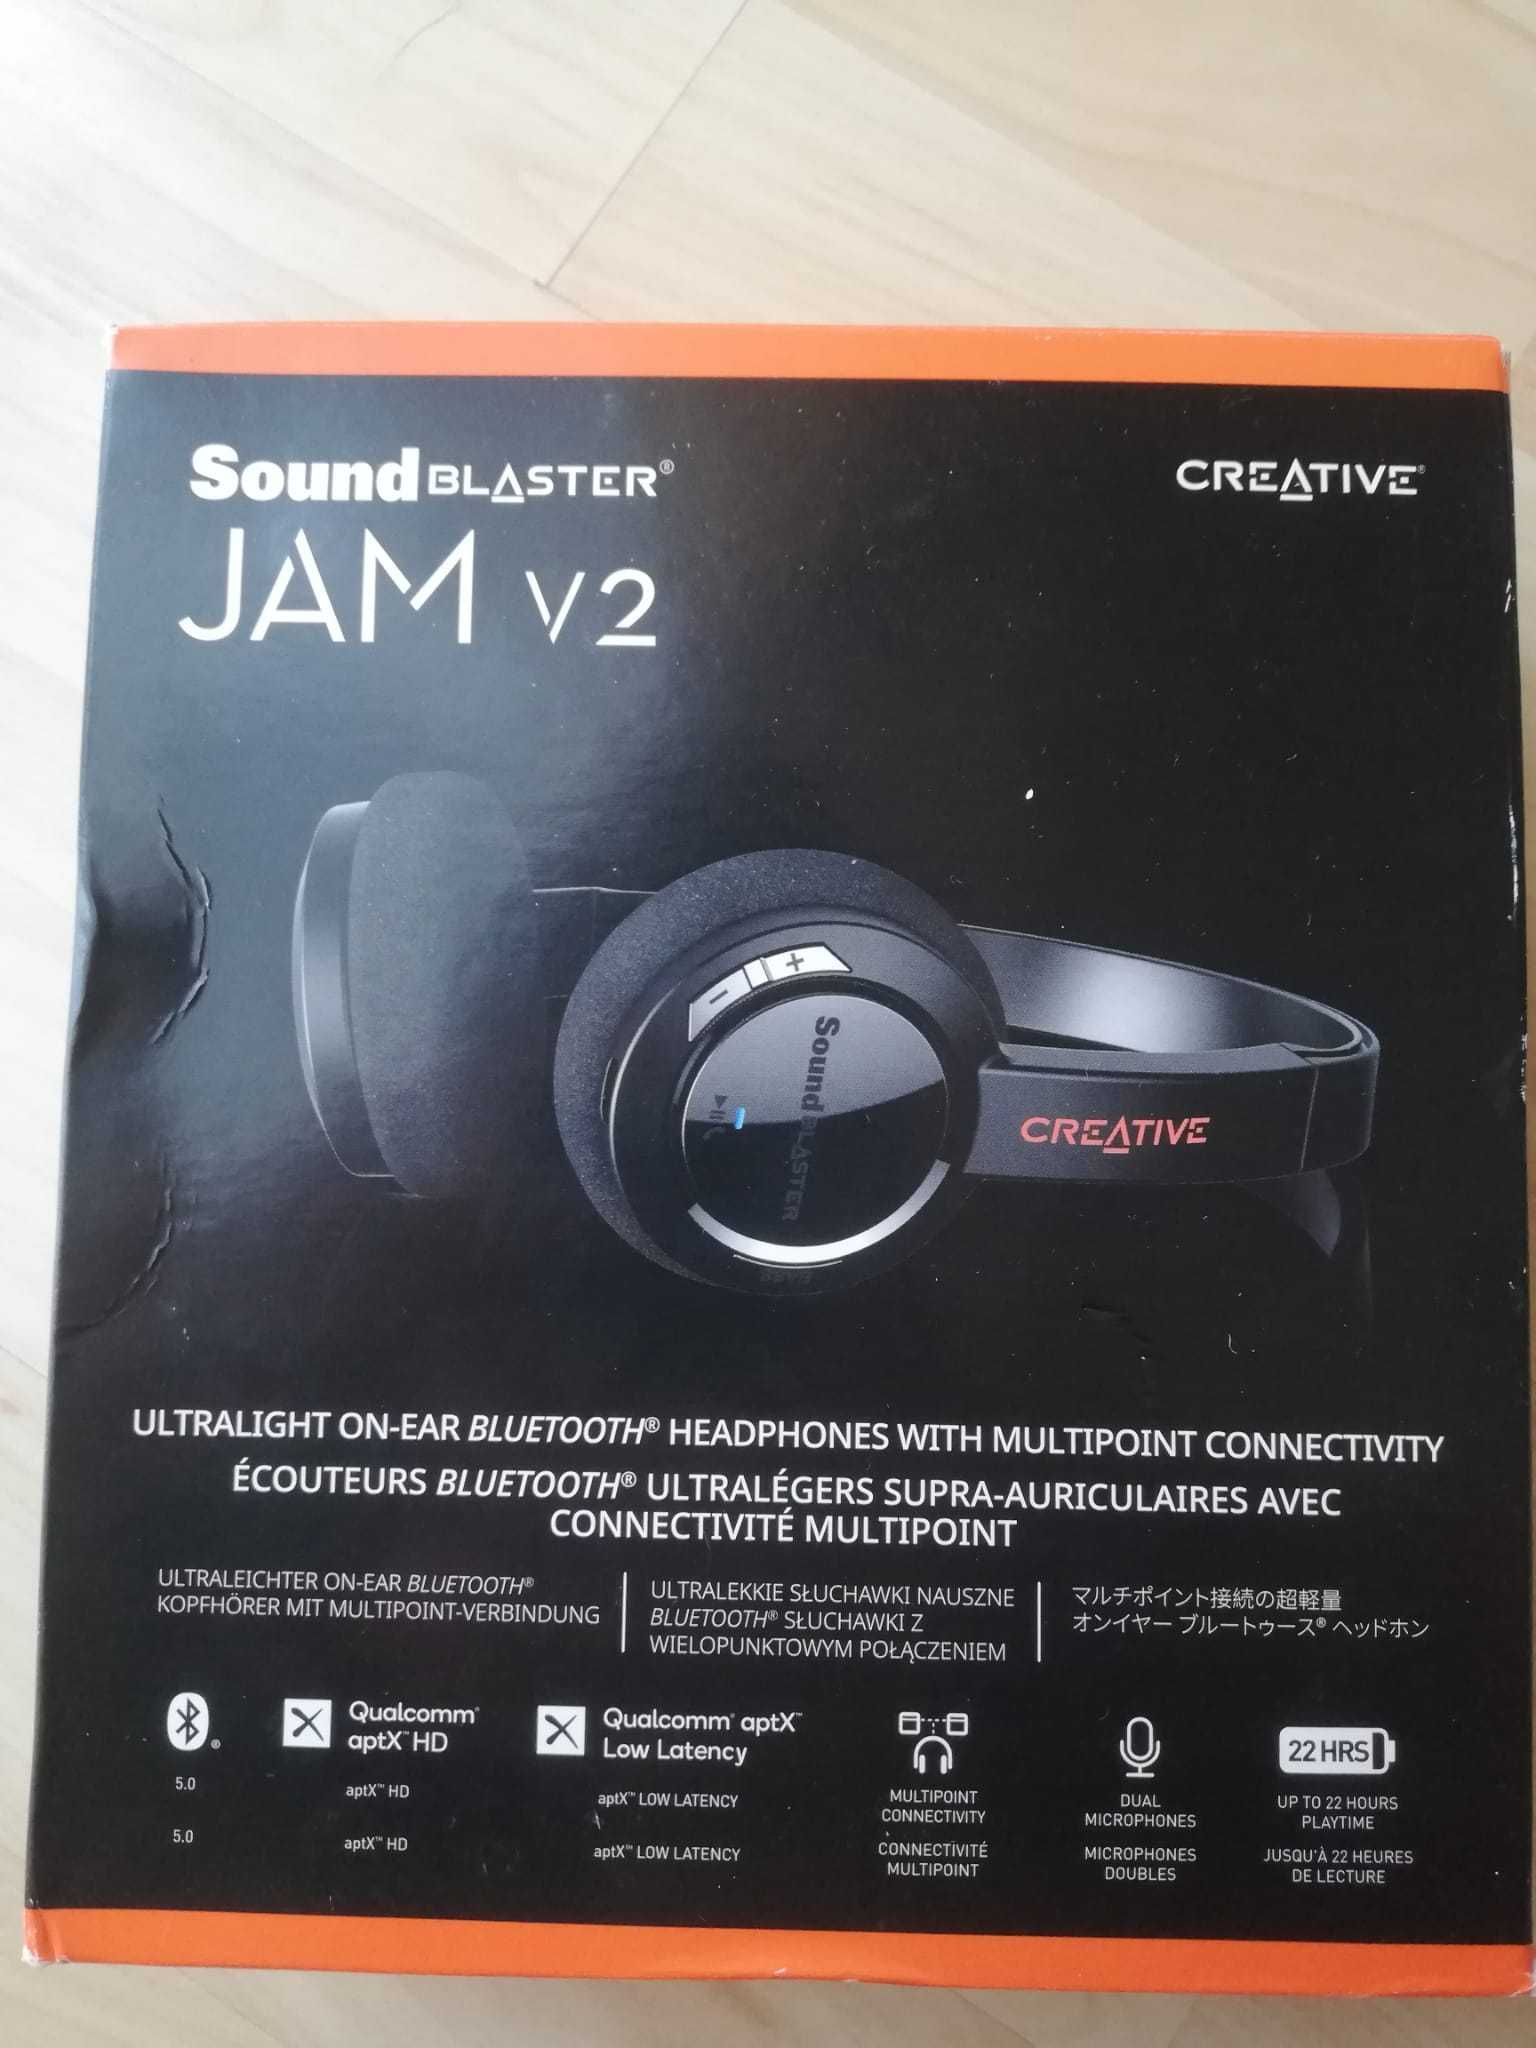 Casti Creative Sound Blaster Jam v2